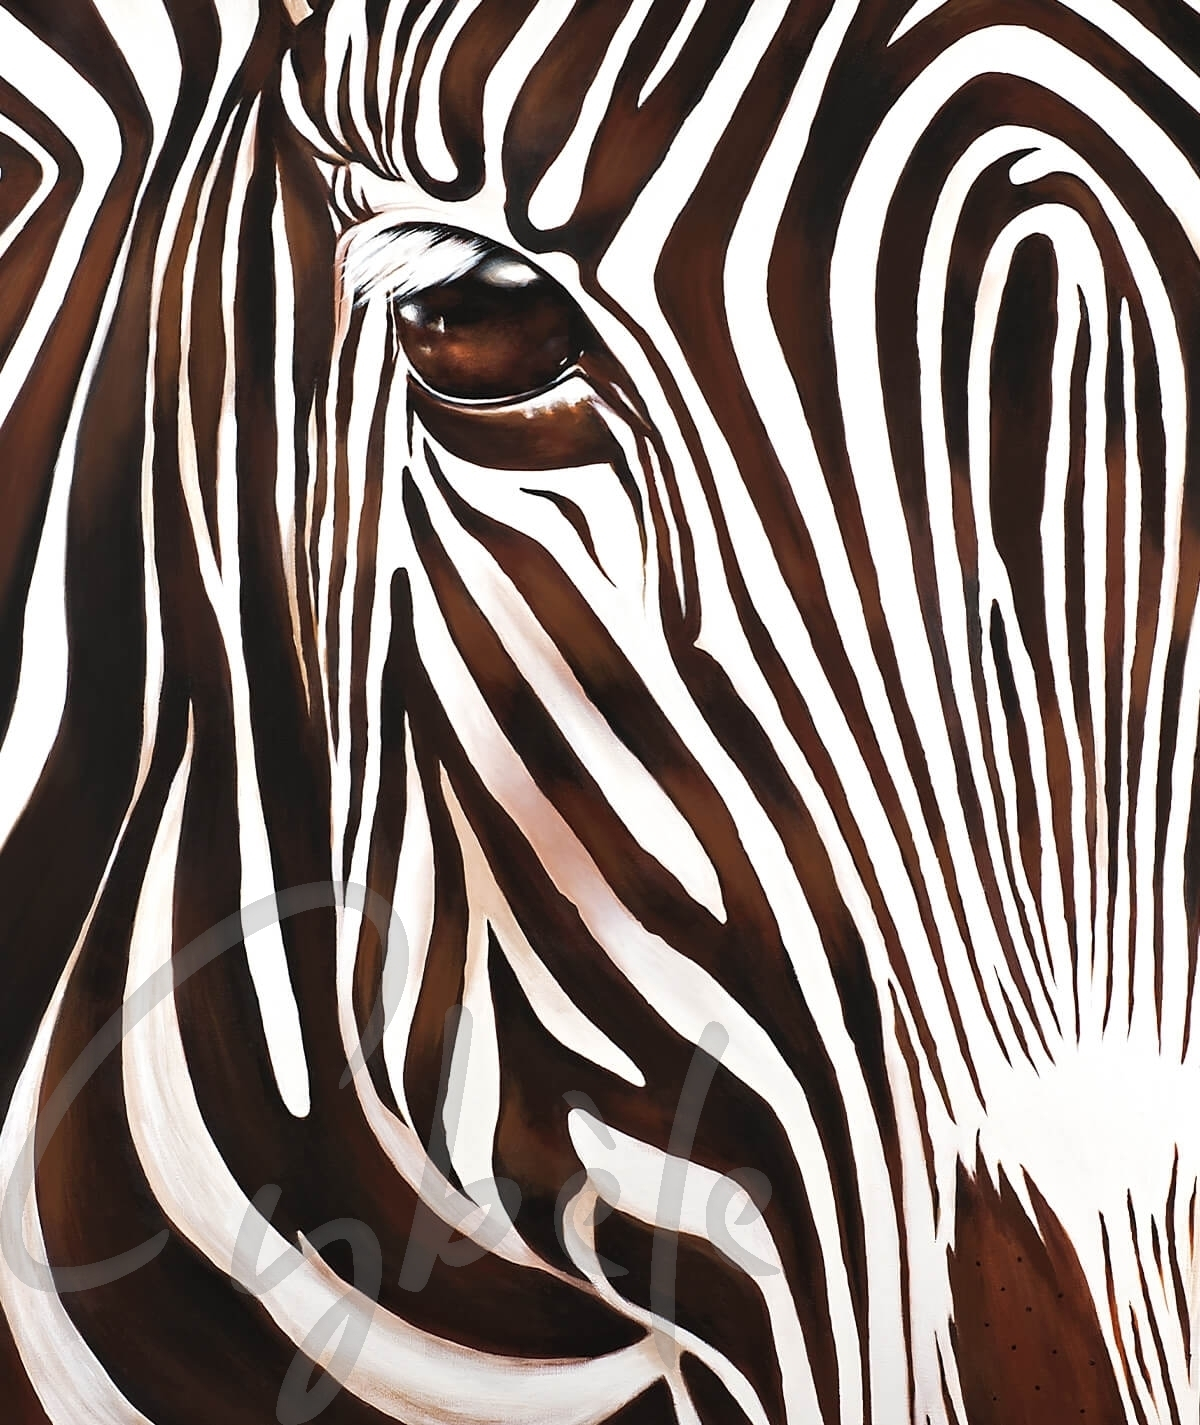 Peinture animalière zèbre marron